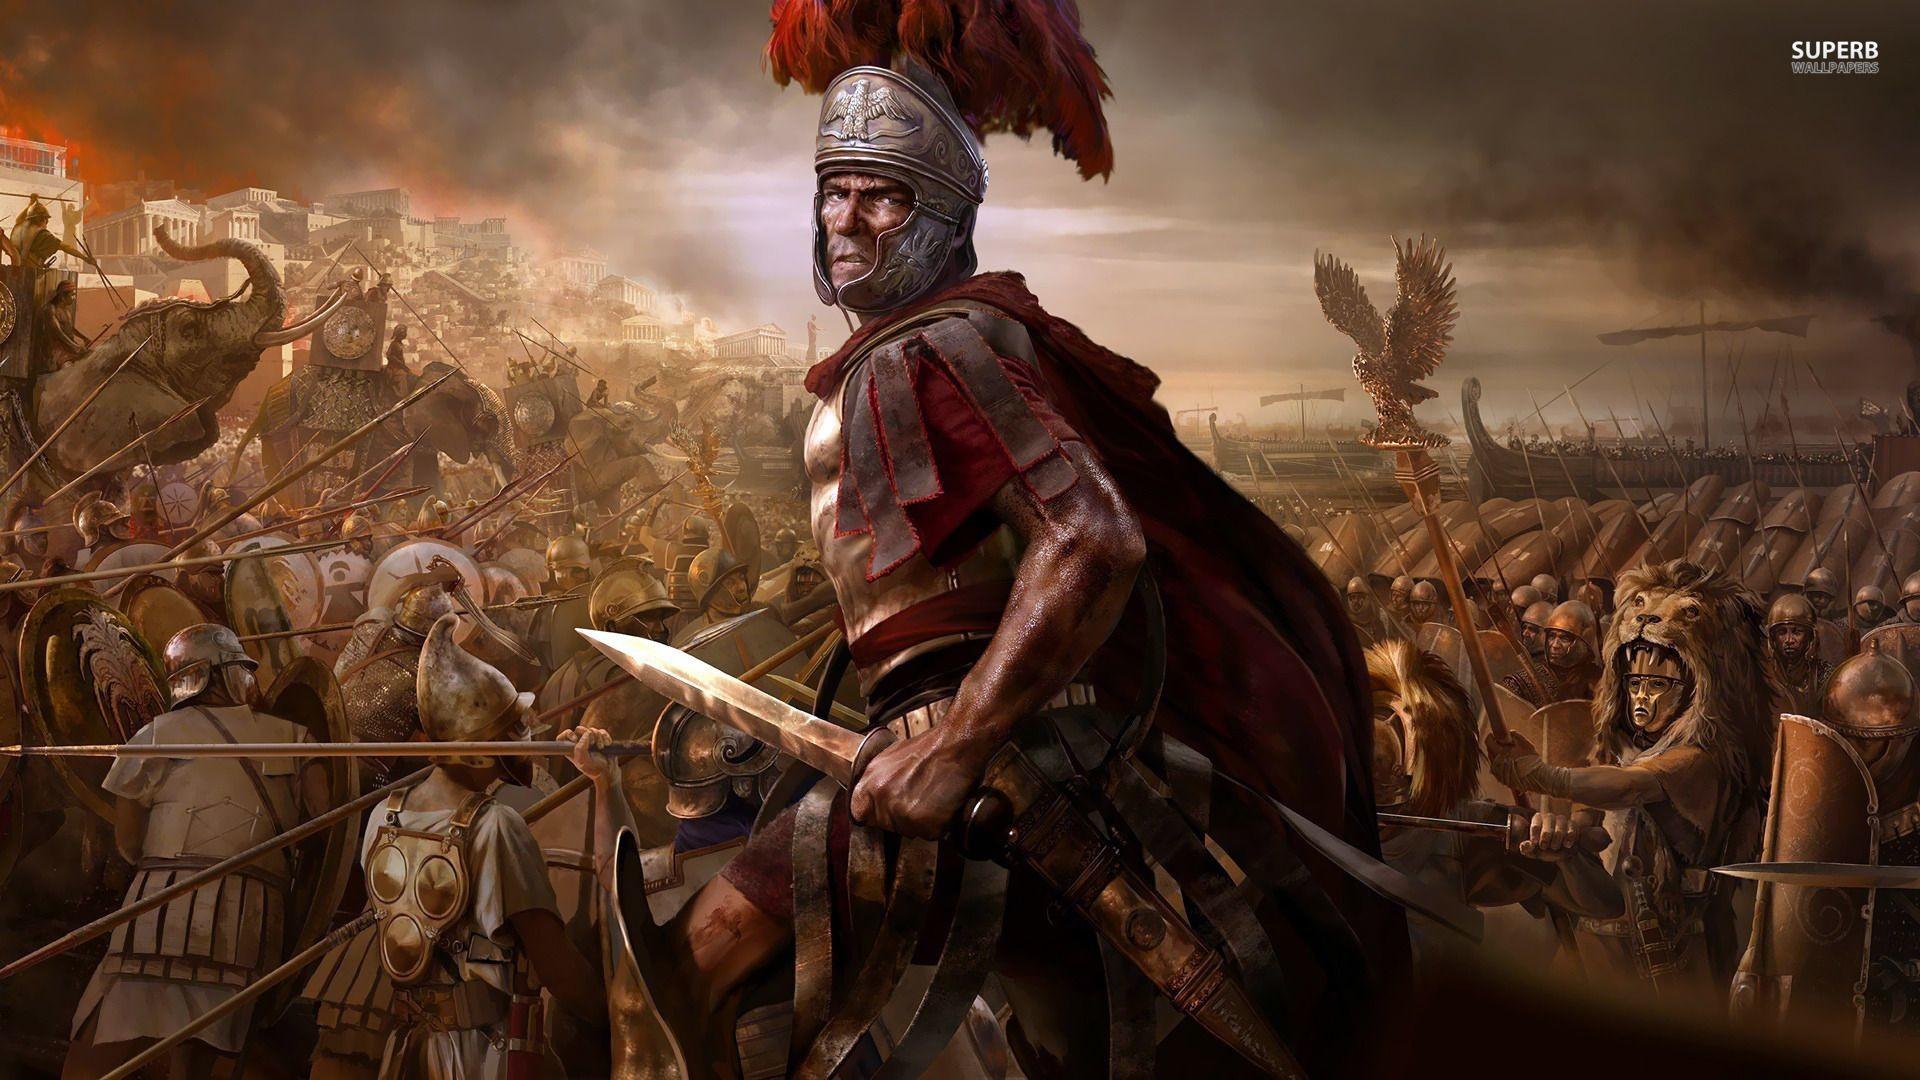 Total War: Rome II wallpaper – Game wallpapers – #28193